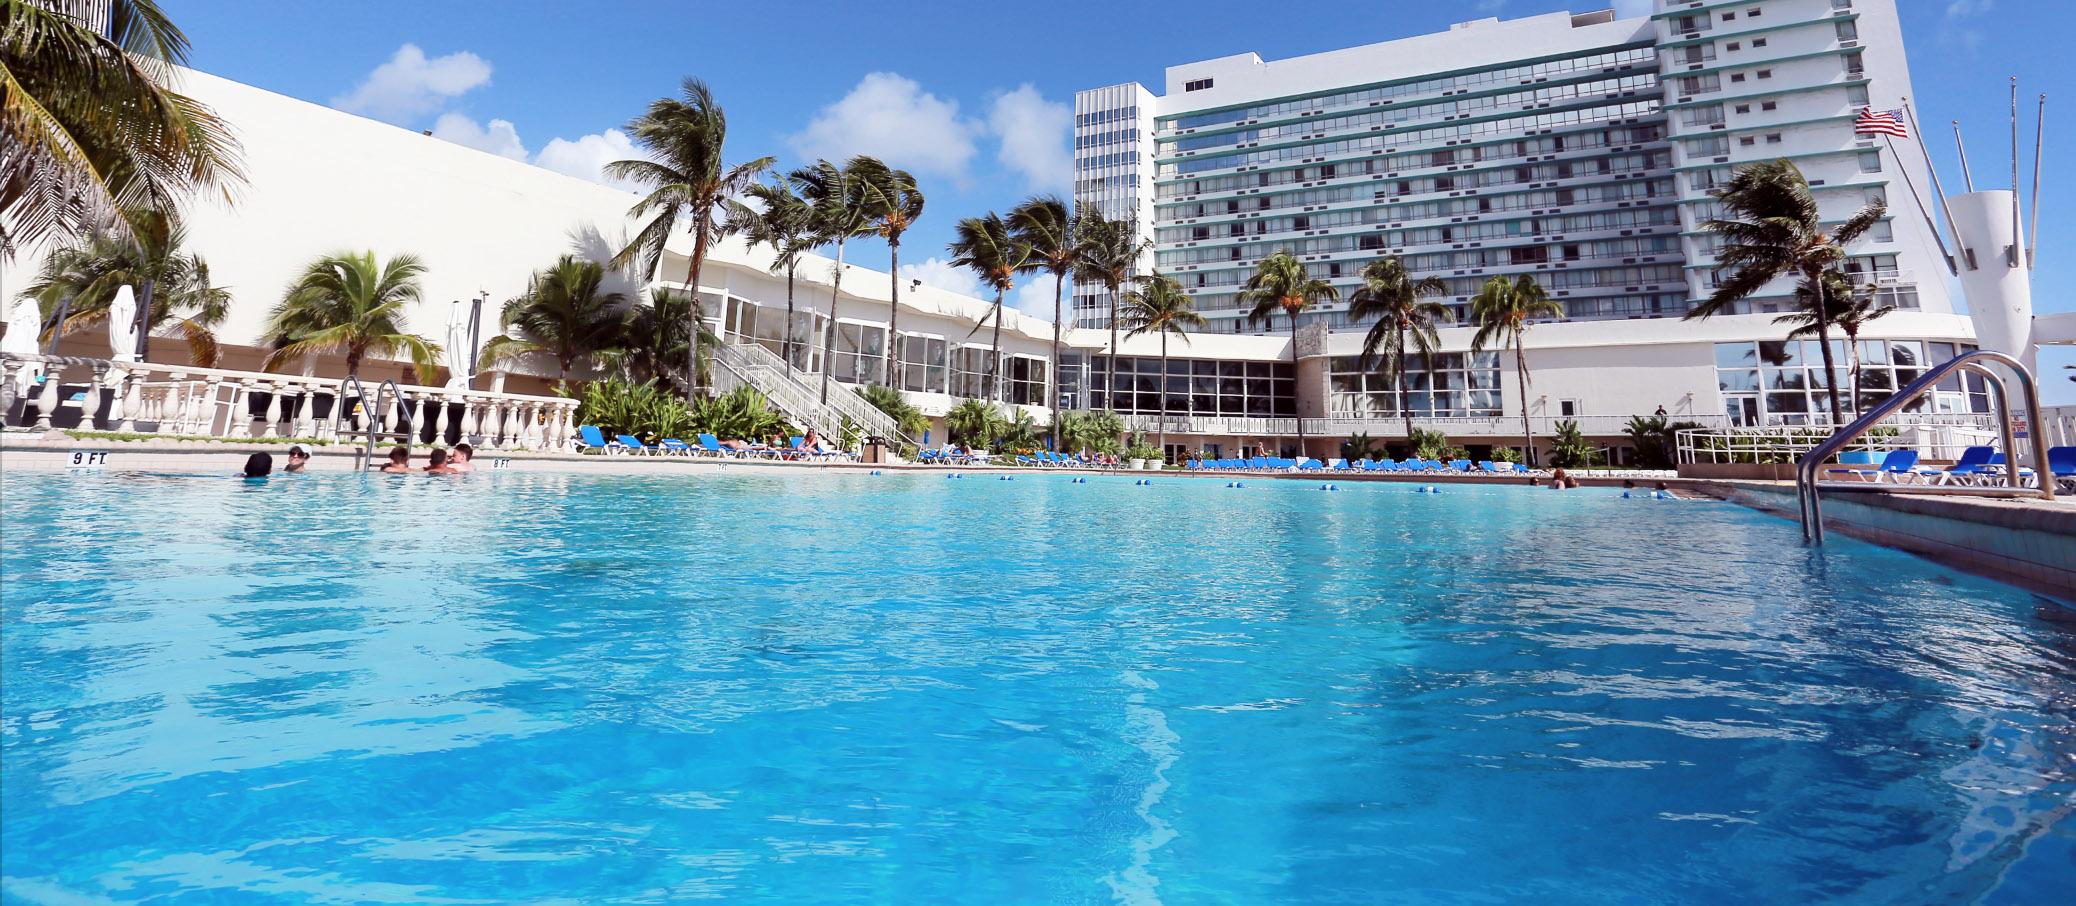 Deauville Beach Resort Miami Pool